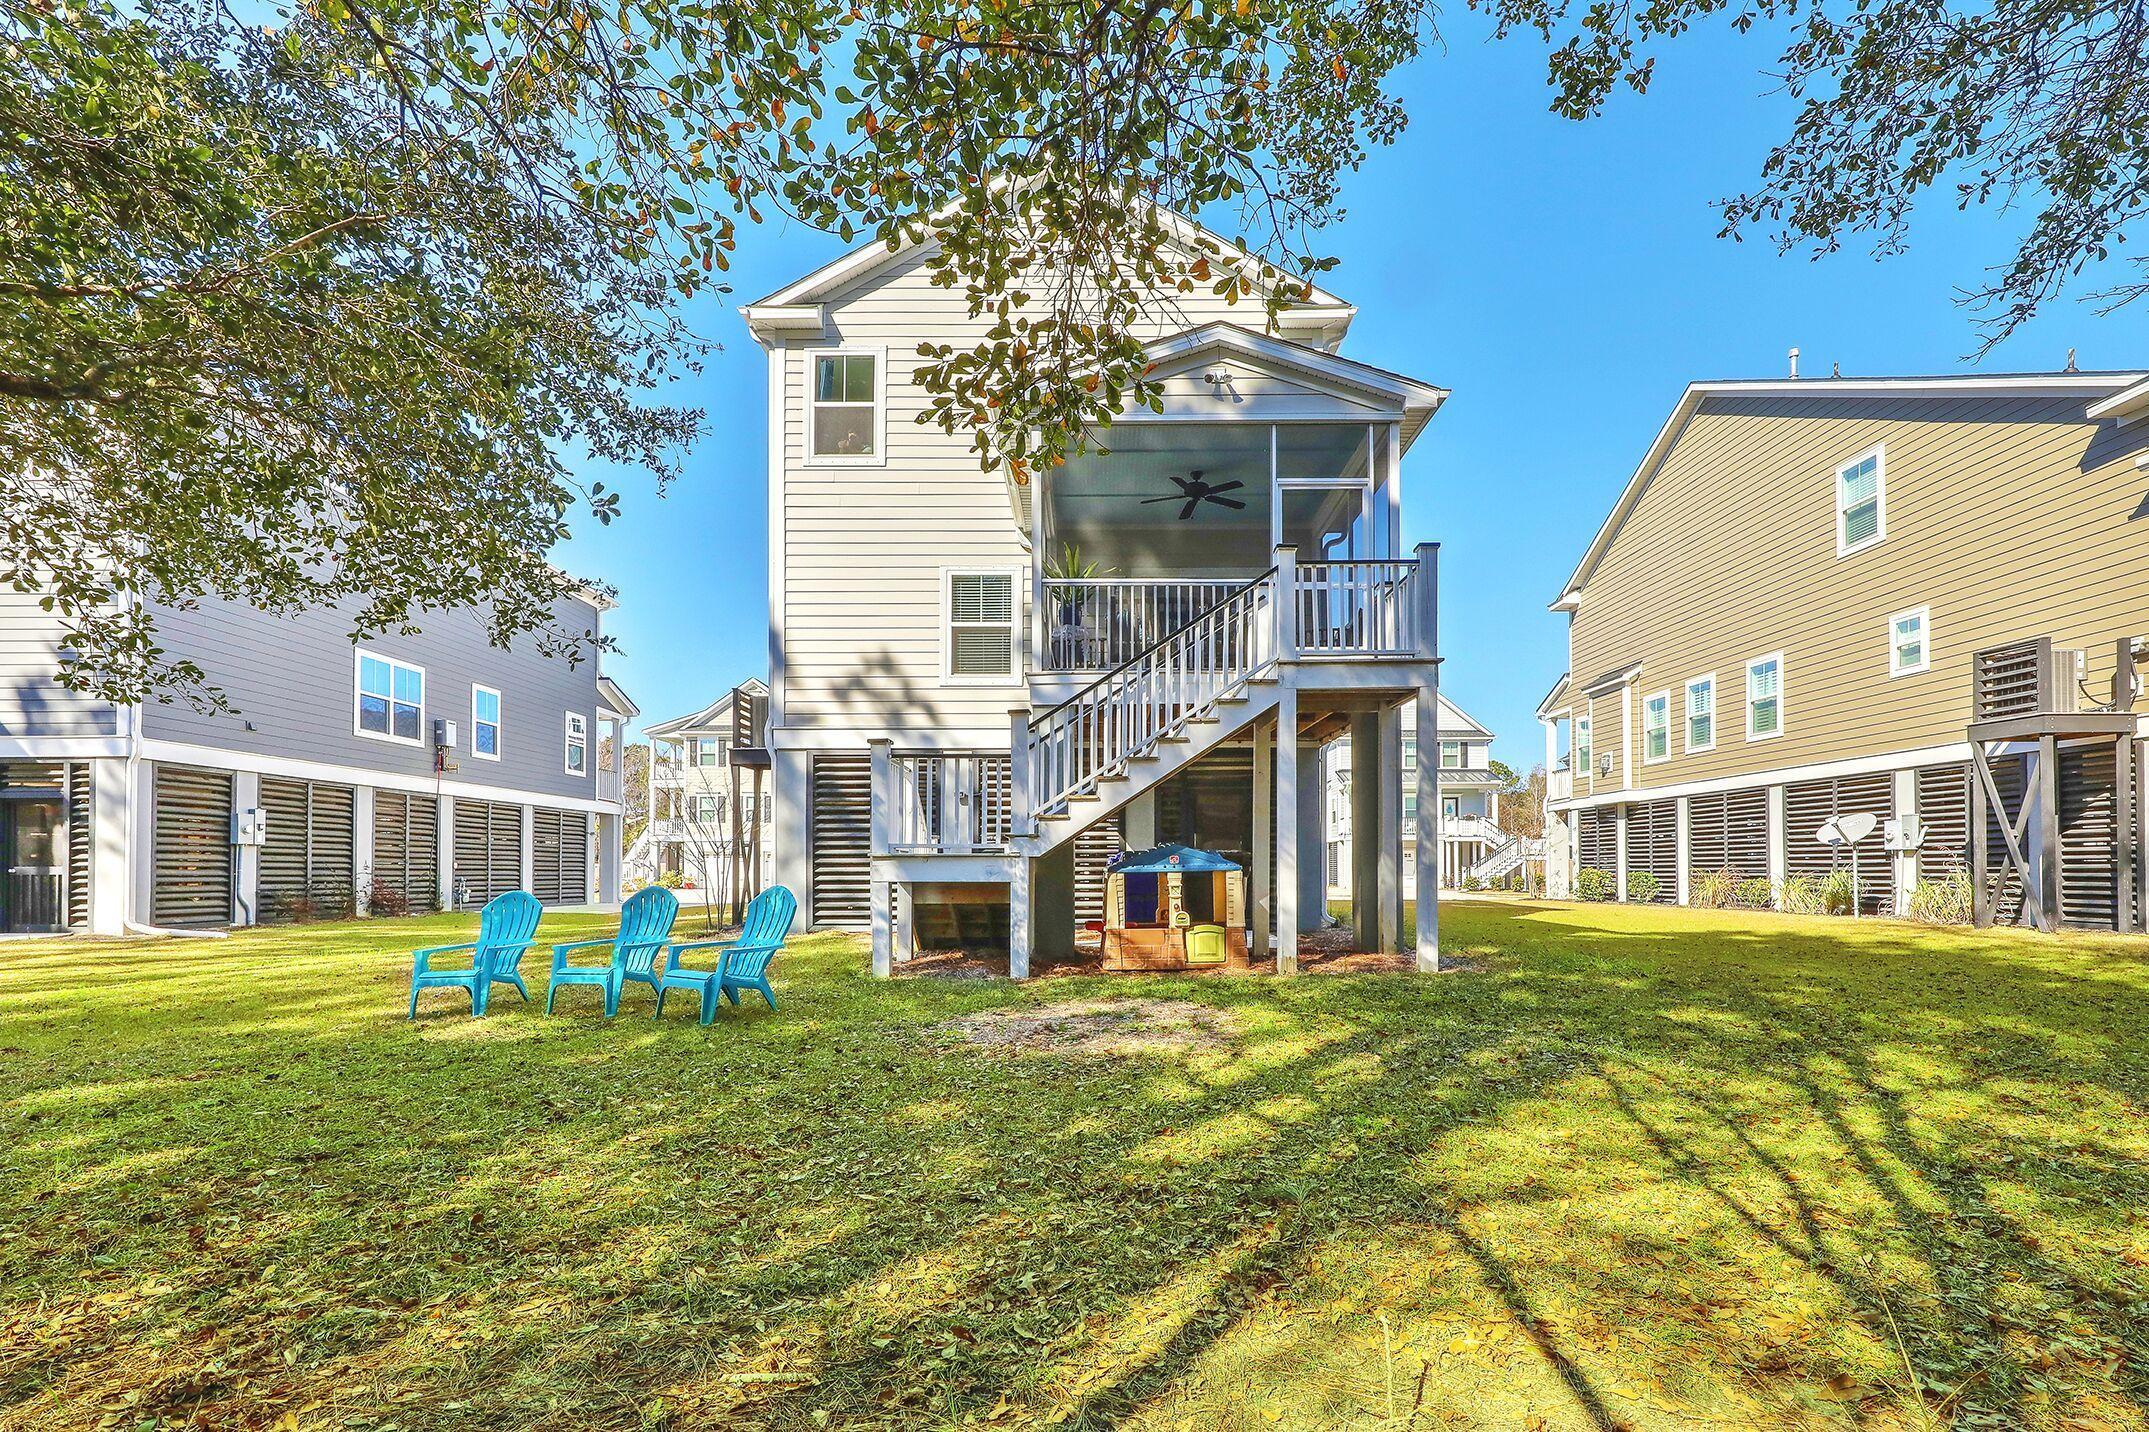 Copahee Landing Homes For Sale - 3731 Copahee Sound, Mount Pleasant, SC - 2